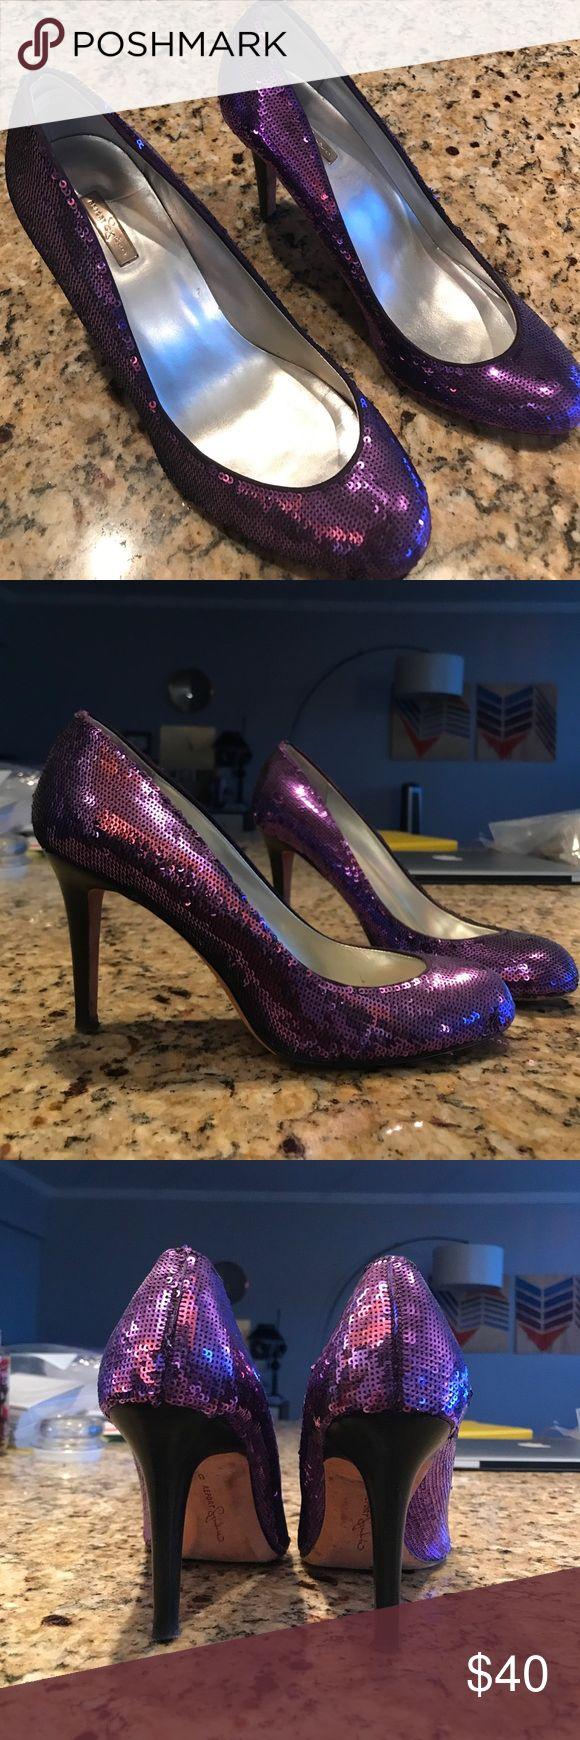 Purple sequined Report Signature heels Purple sequined Report Signature heels. 3.5 in heels. Great condition. Report Signature Shoes Heels